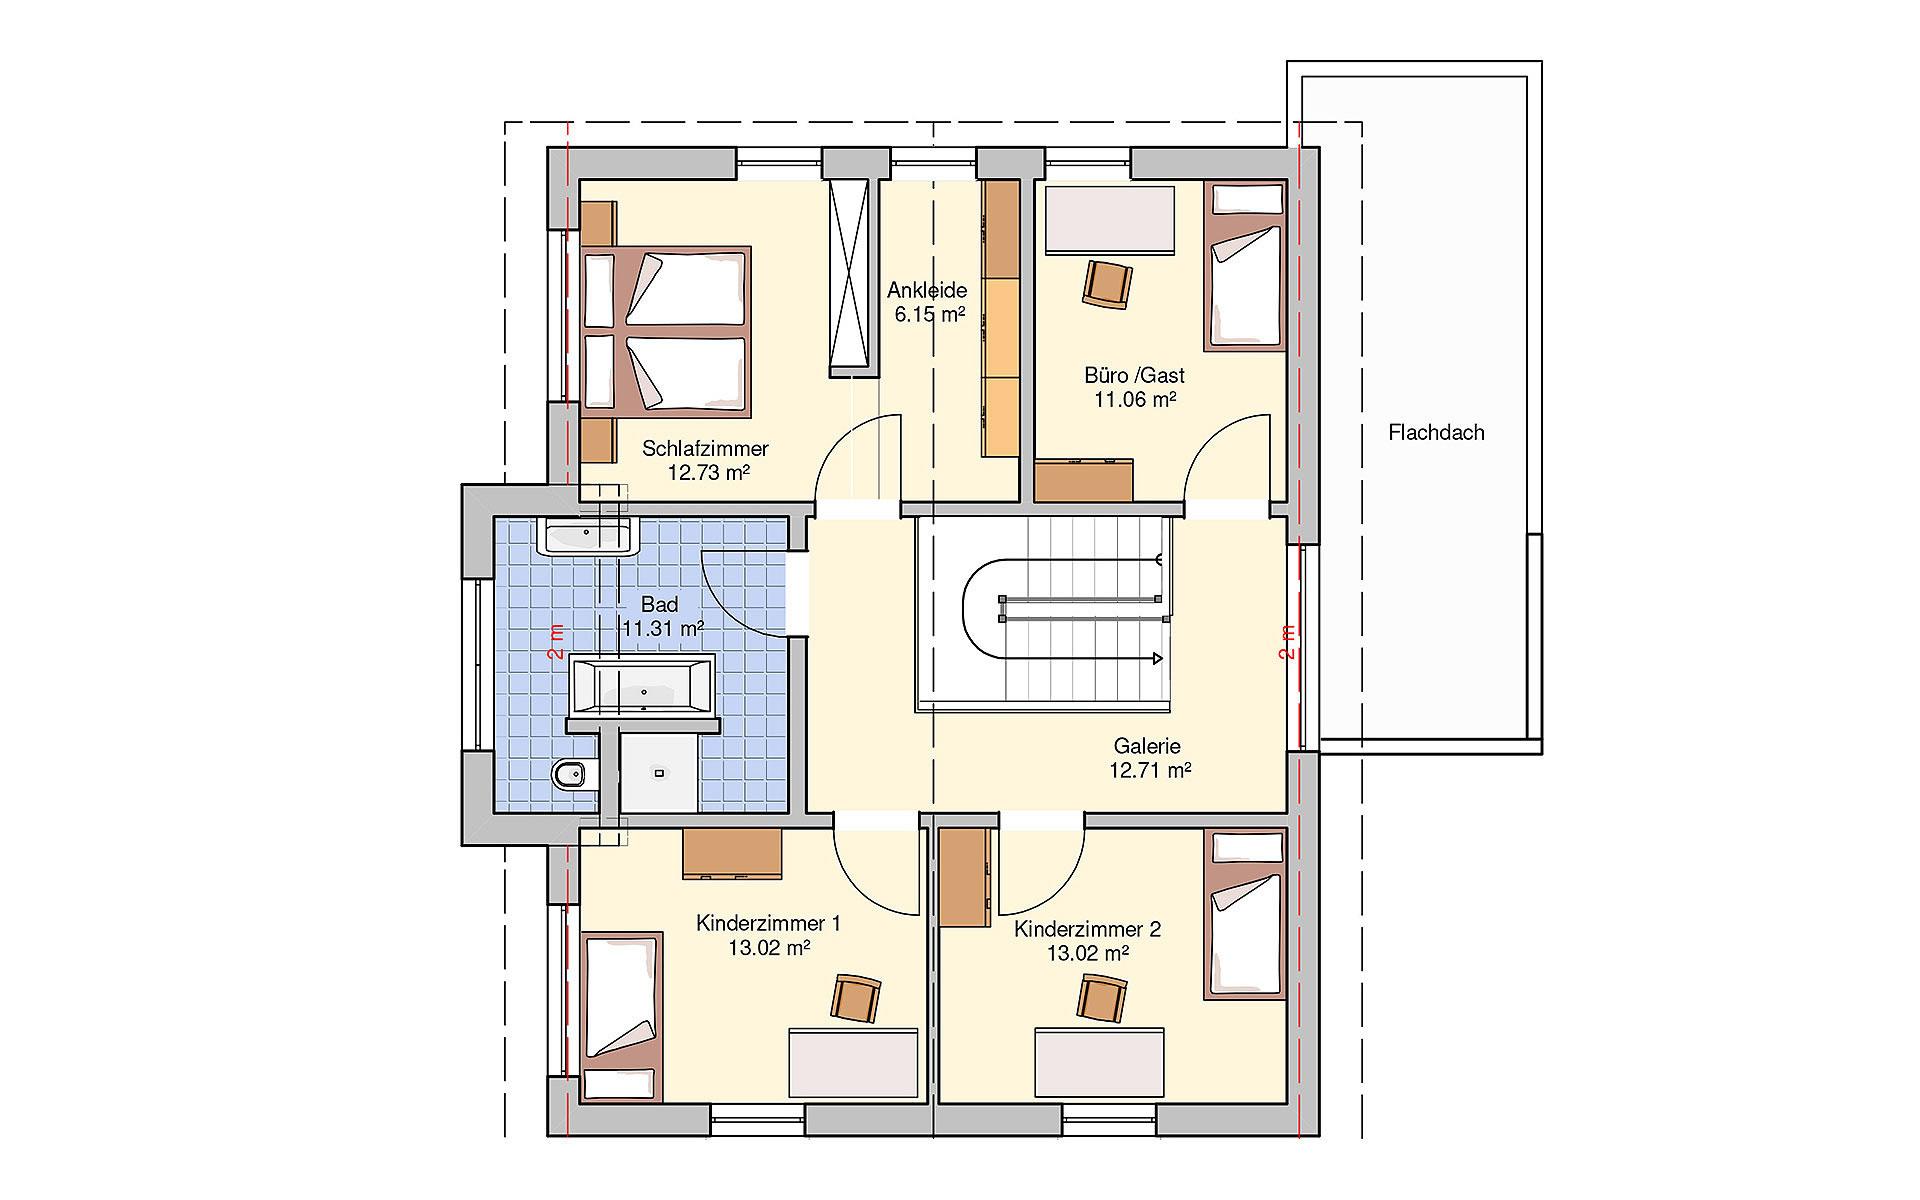 Dachgeschoss Günzburg (Musterhaus) von Fingerhut Haus GmbH & Co. KG